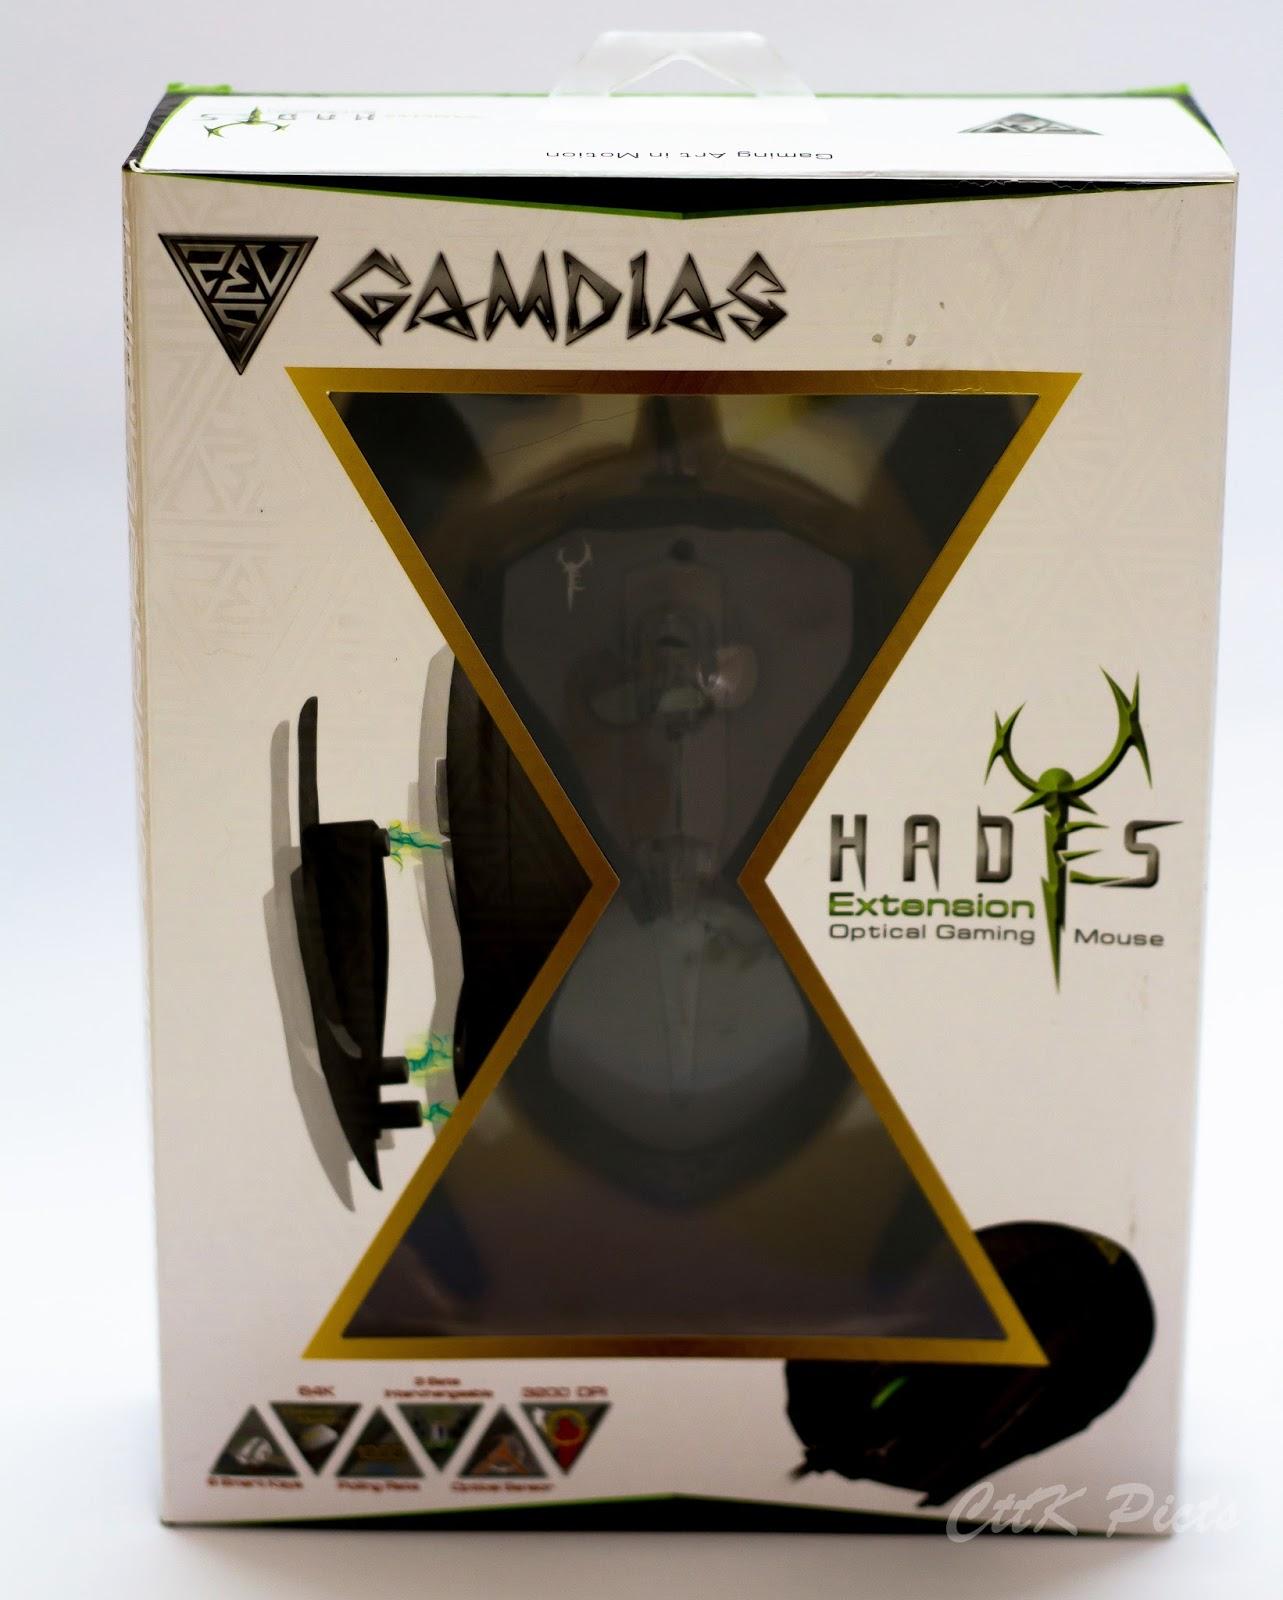 Gamdias Hades Extension Optical Gaming Mouse 54